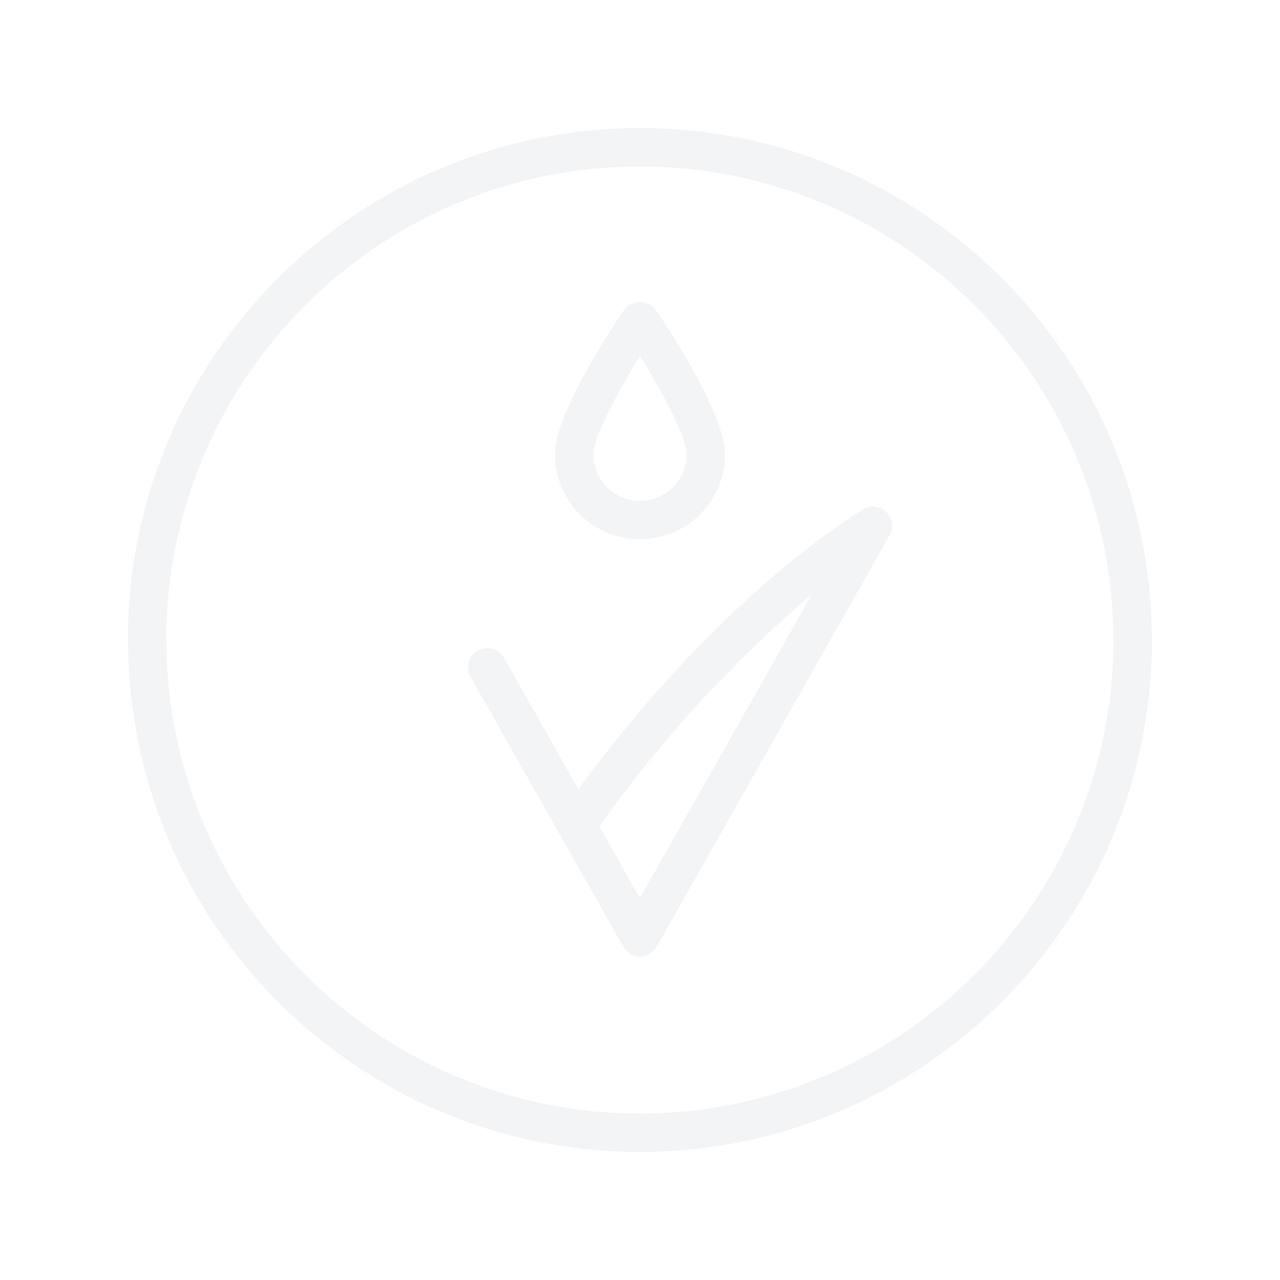 MIZON Joyful Time Essence Vitamin Mask 23g тканевая маска для лица